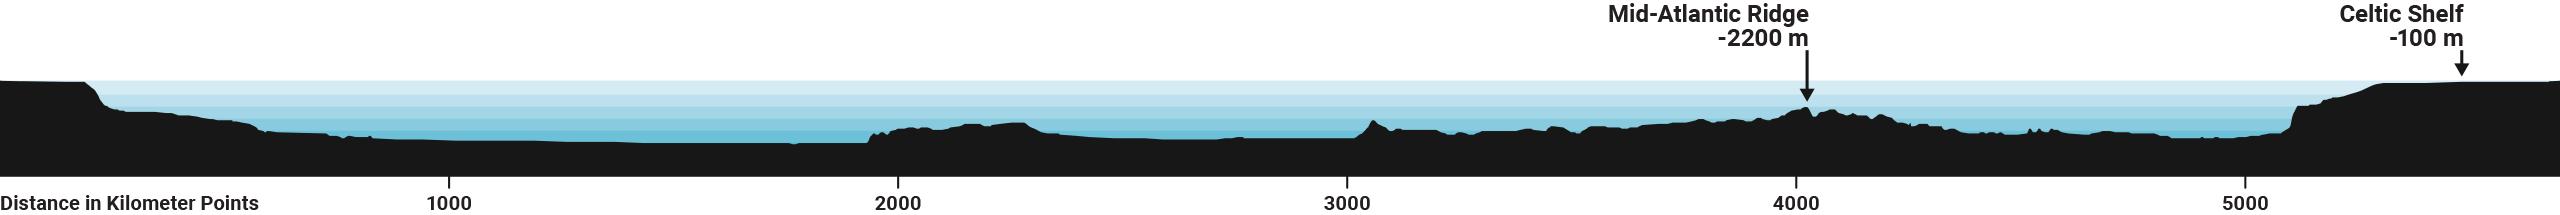 transatlantic seabed profile